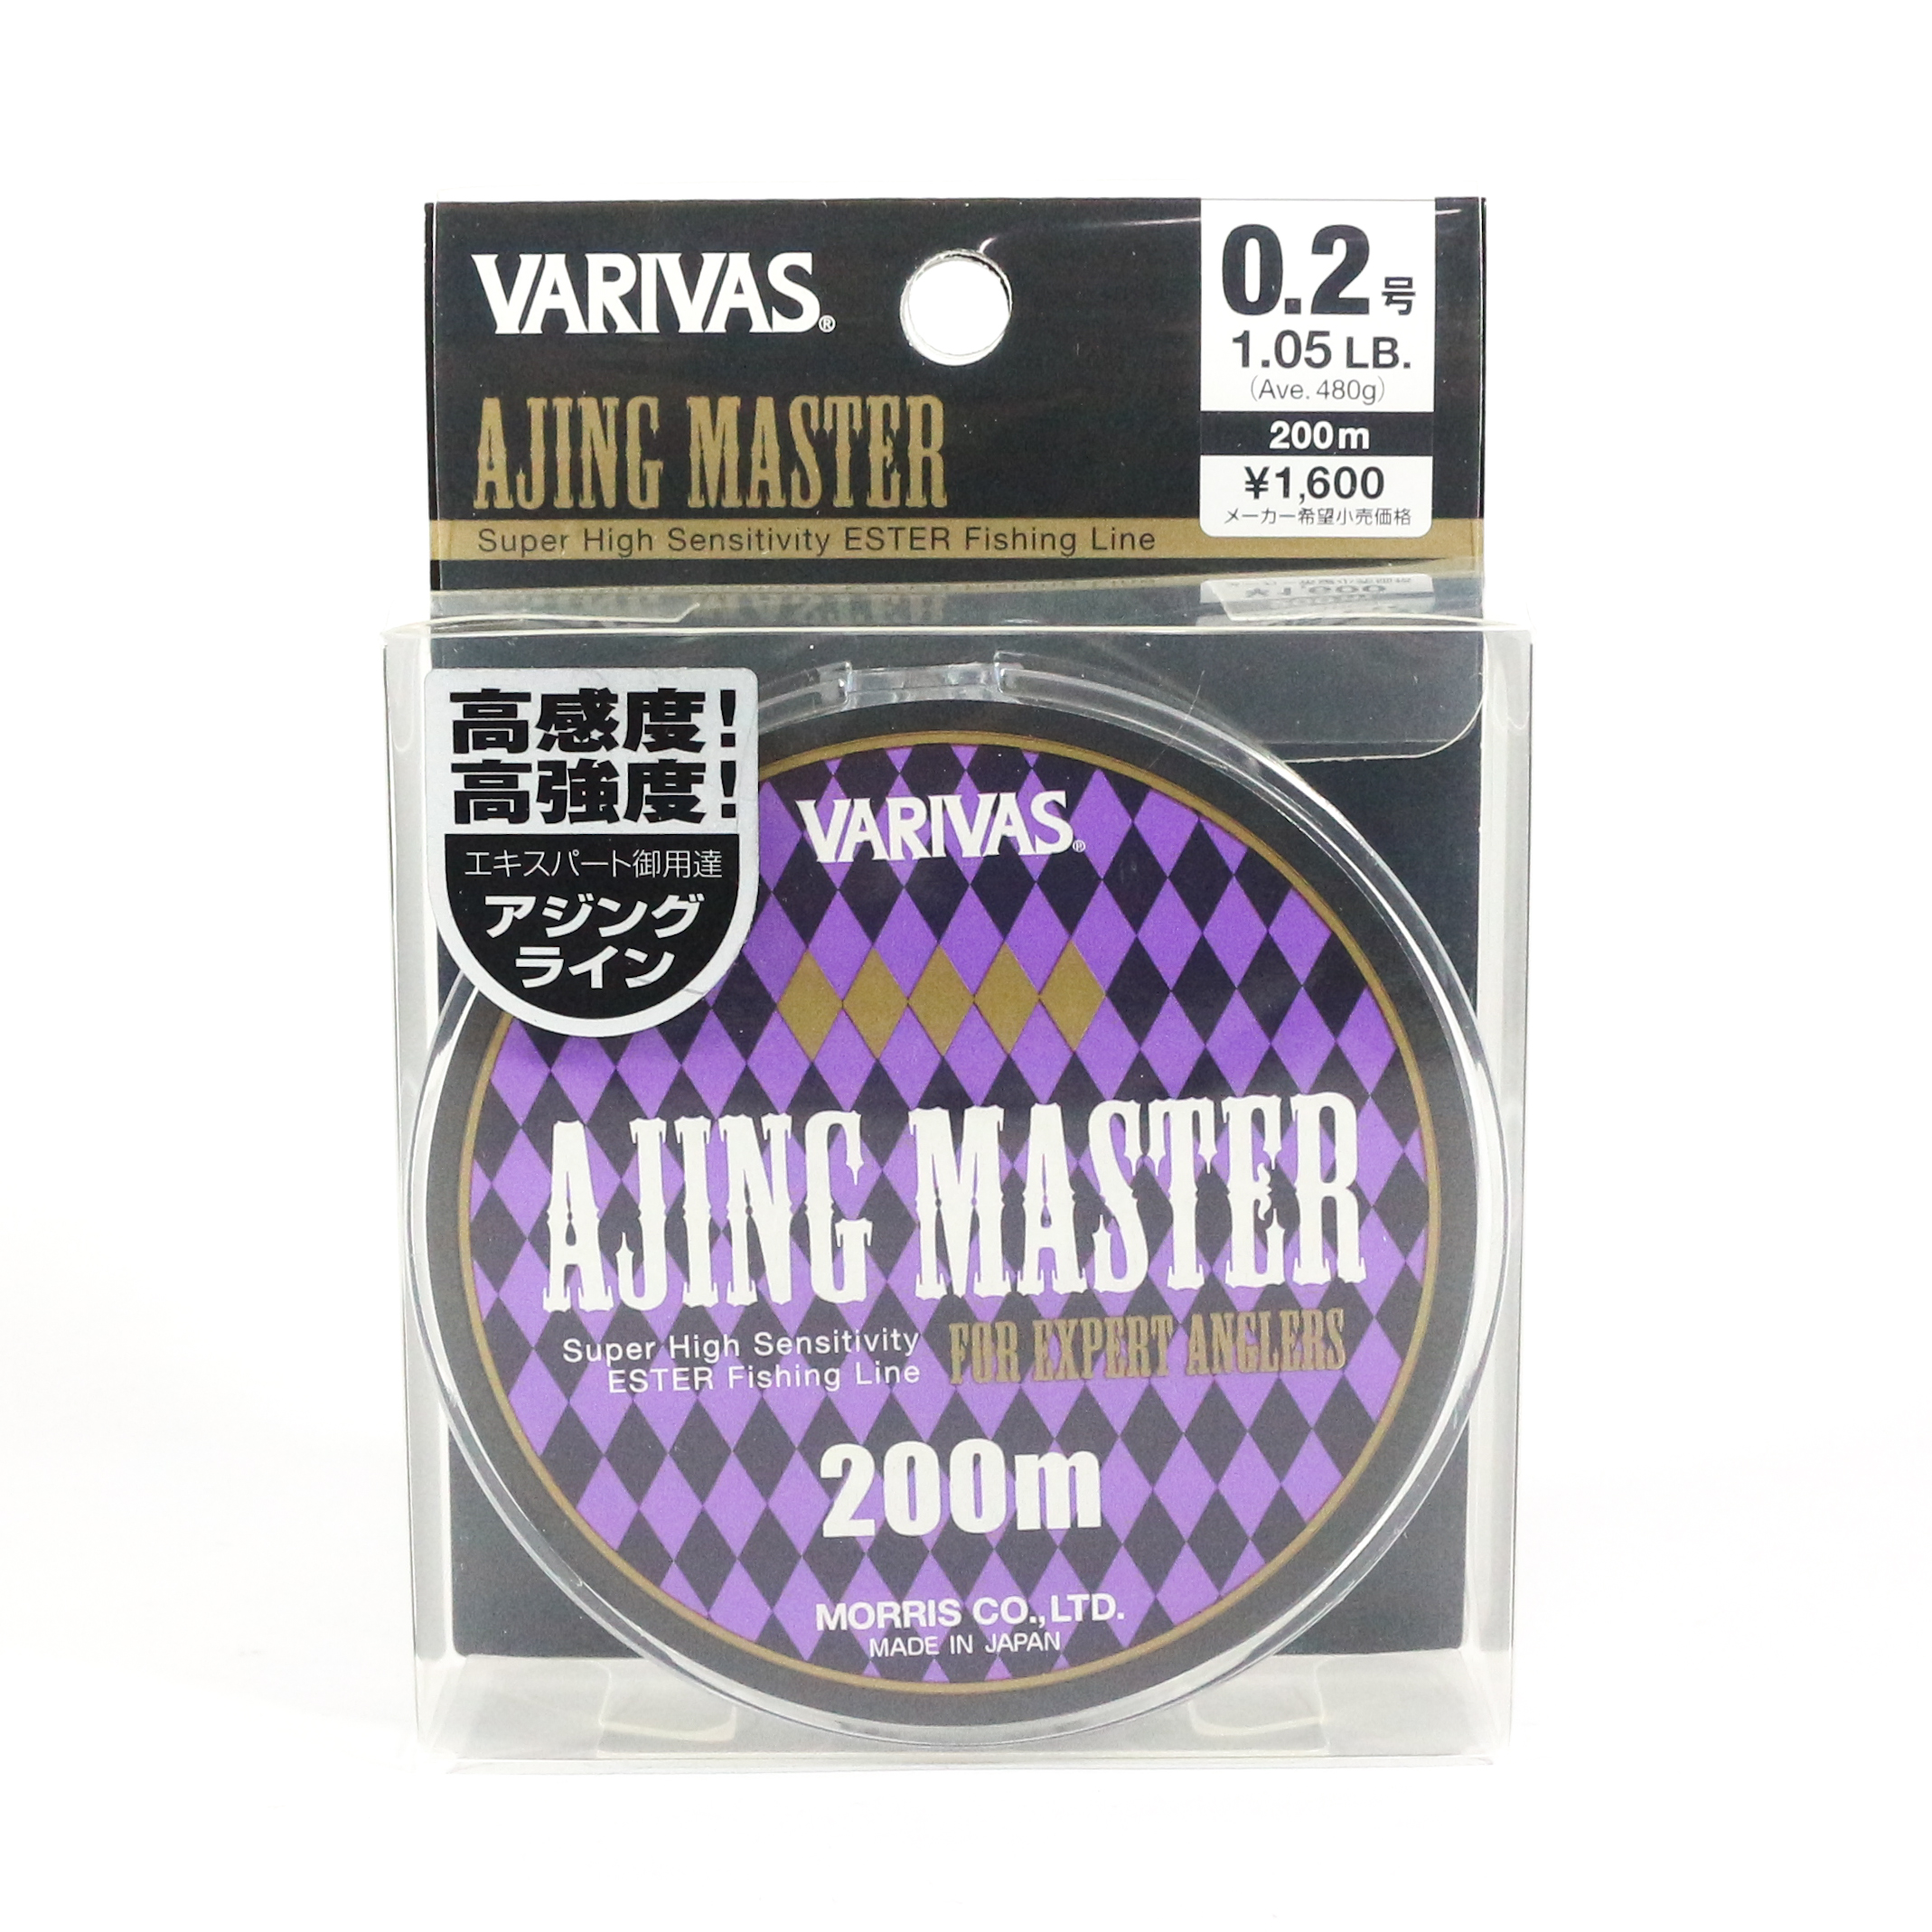 Varivas Ester Line Ajing Master 200m P.E 0.2, 1.05lb (8545)